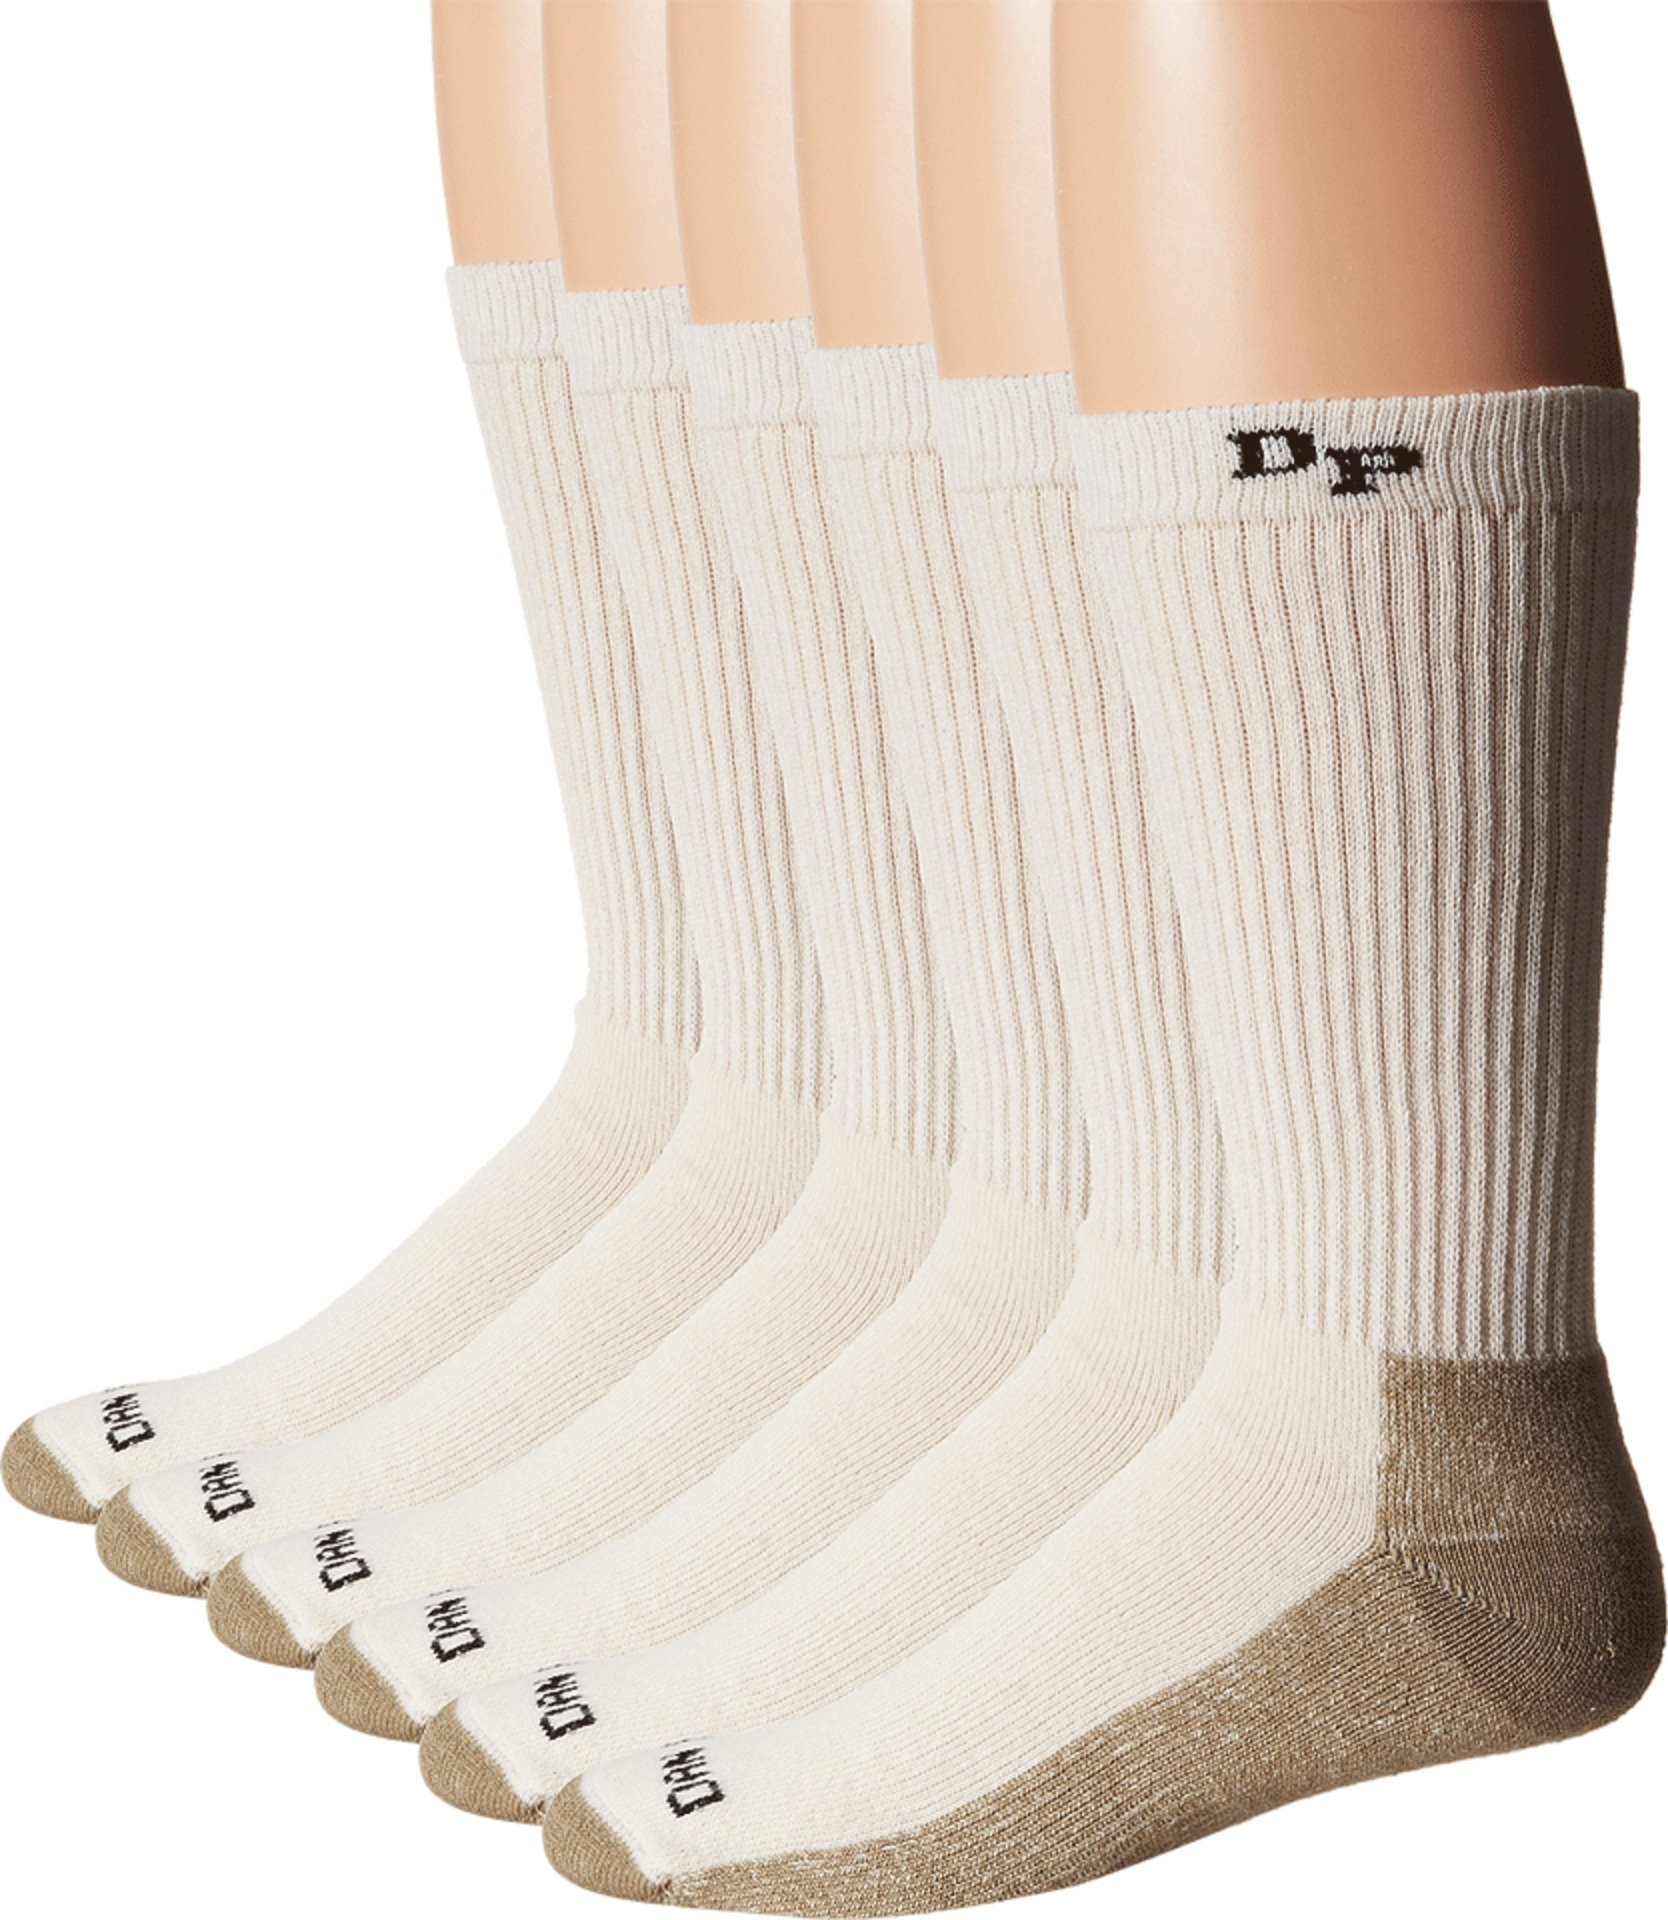 Dan Post  Men's Dan Post Work & Outdoor Socks Mid Calf Mediumweight Steel Toe 6 pack Natural Medium